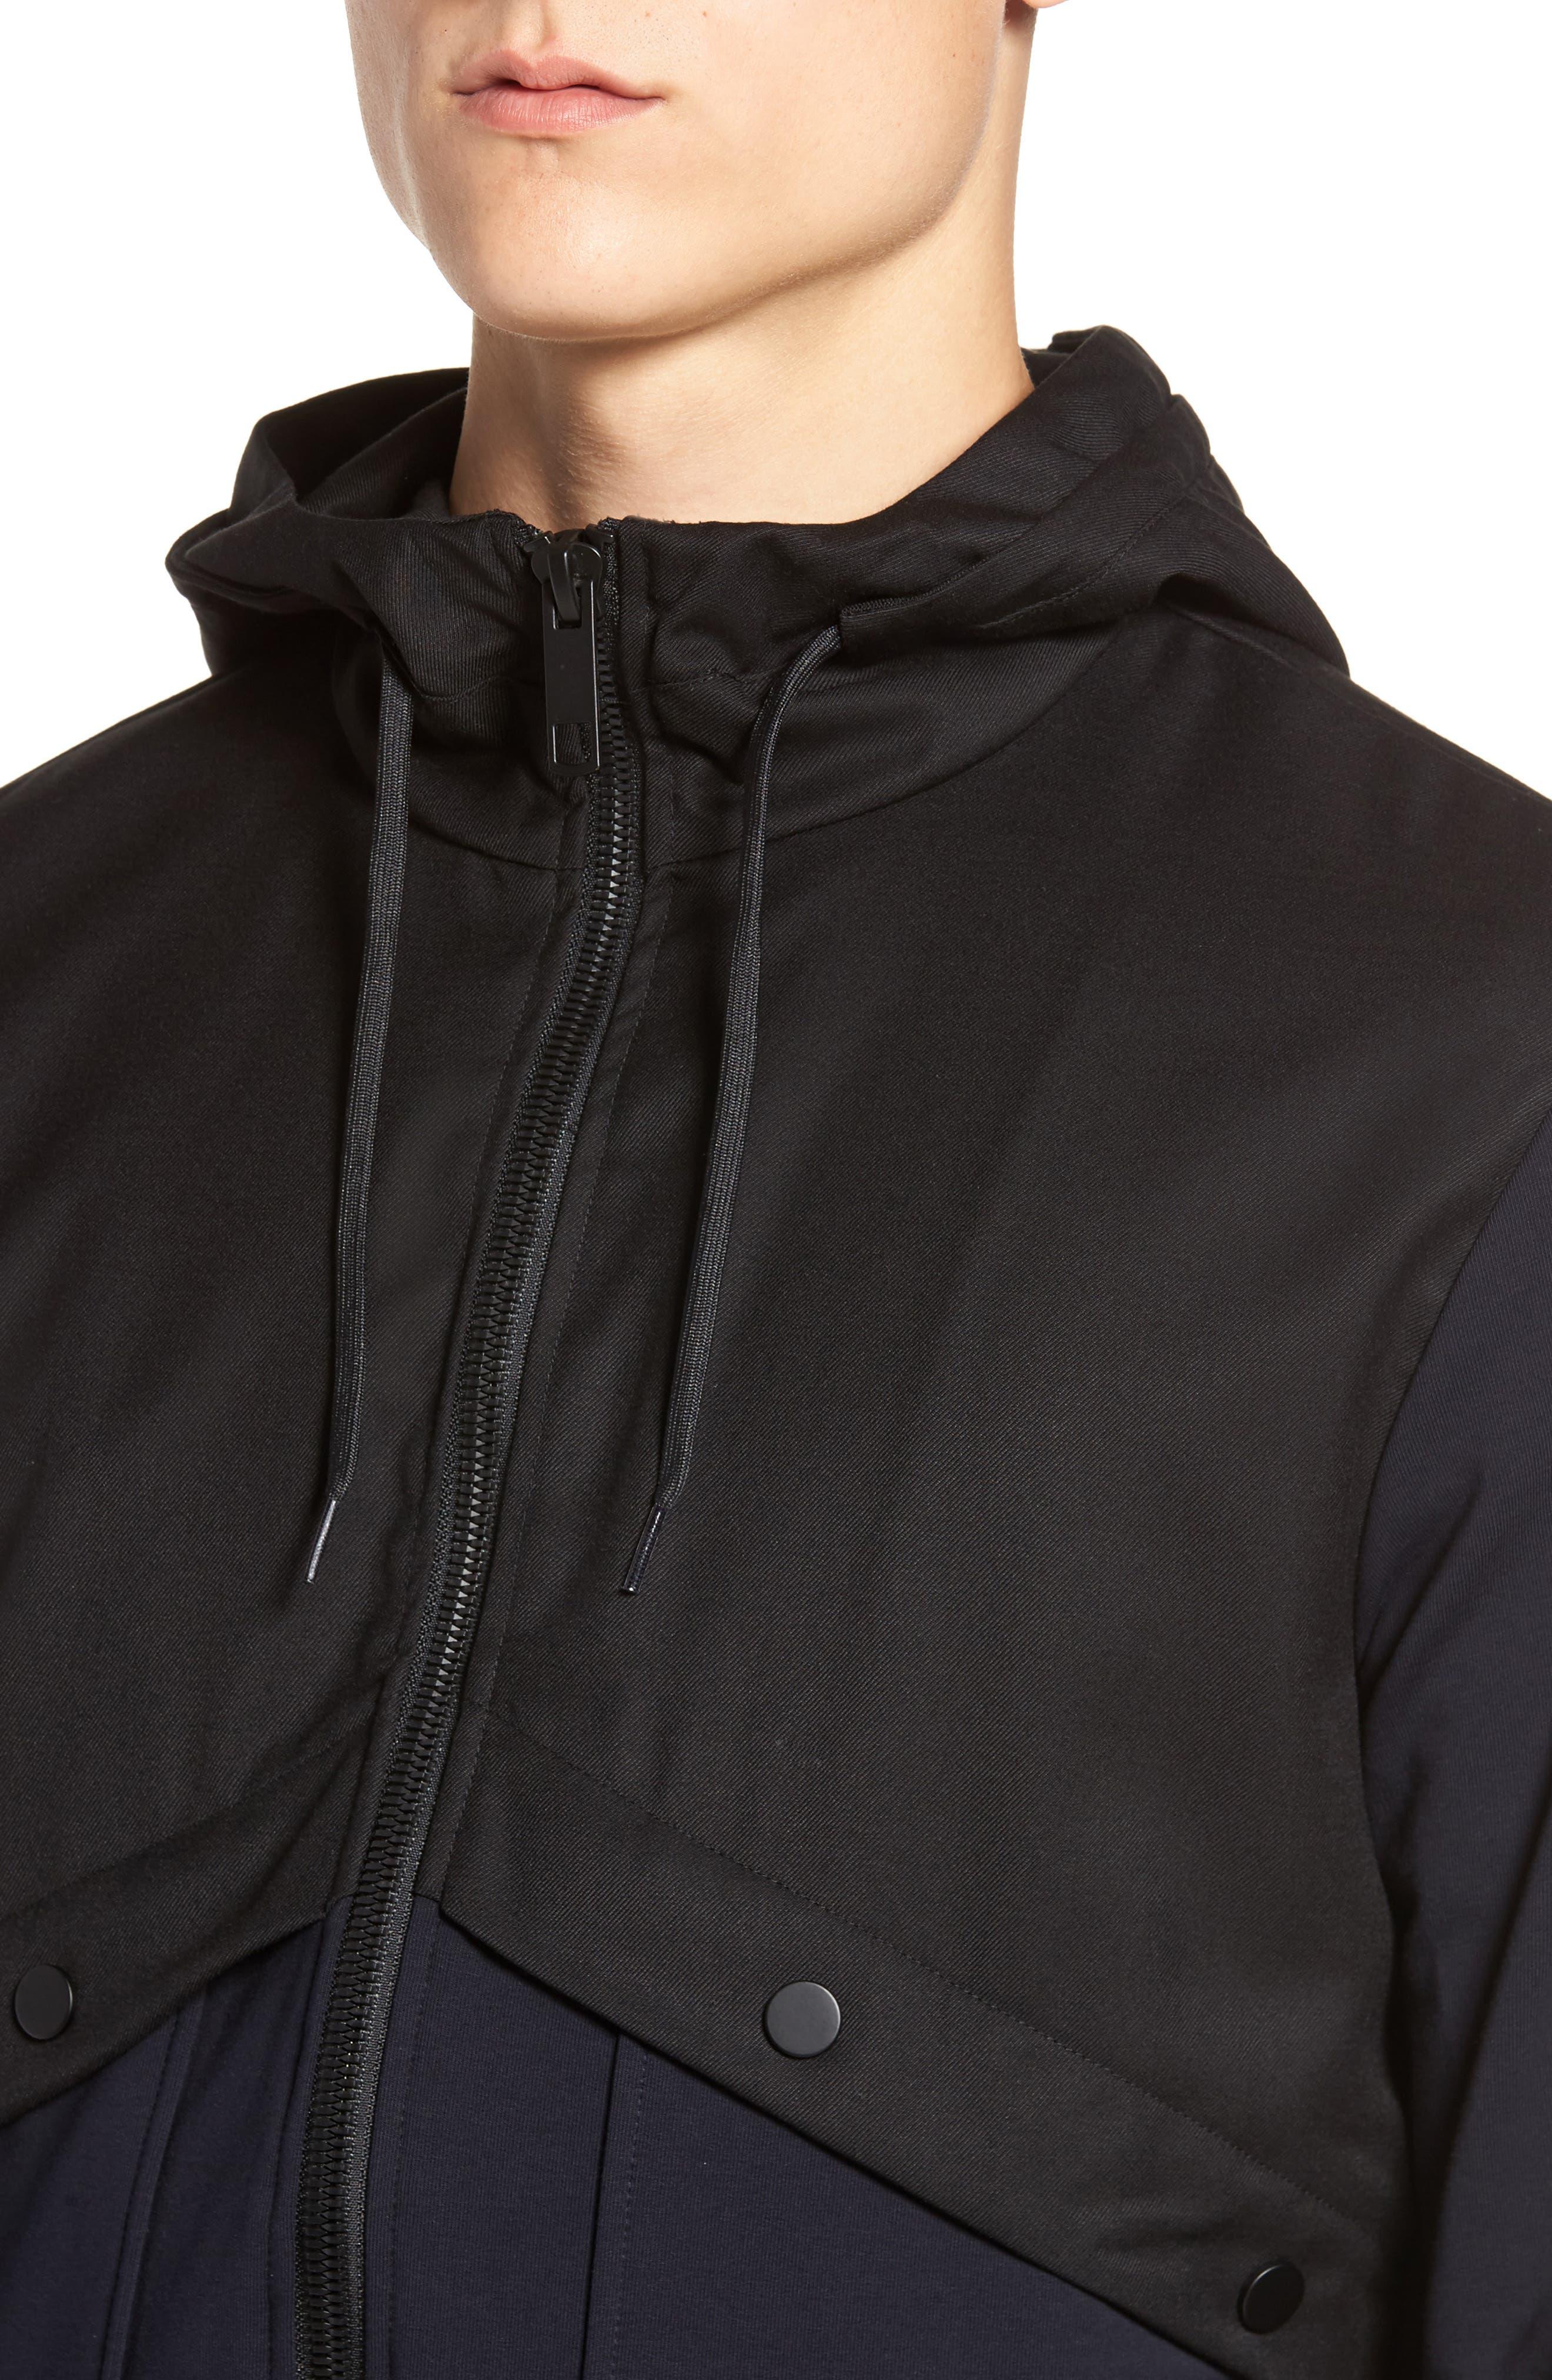 Fleece Zip Up Jacket,                             Alternate thumbnail 4, color,